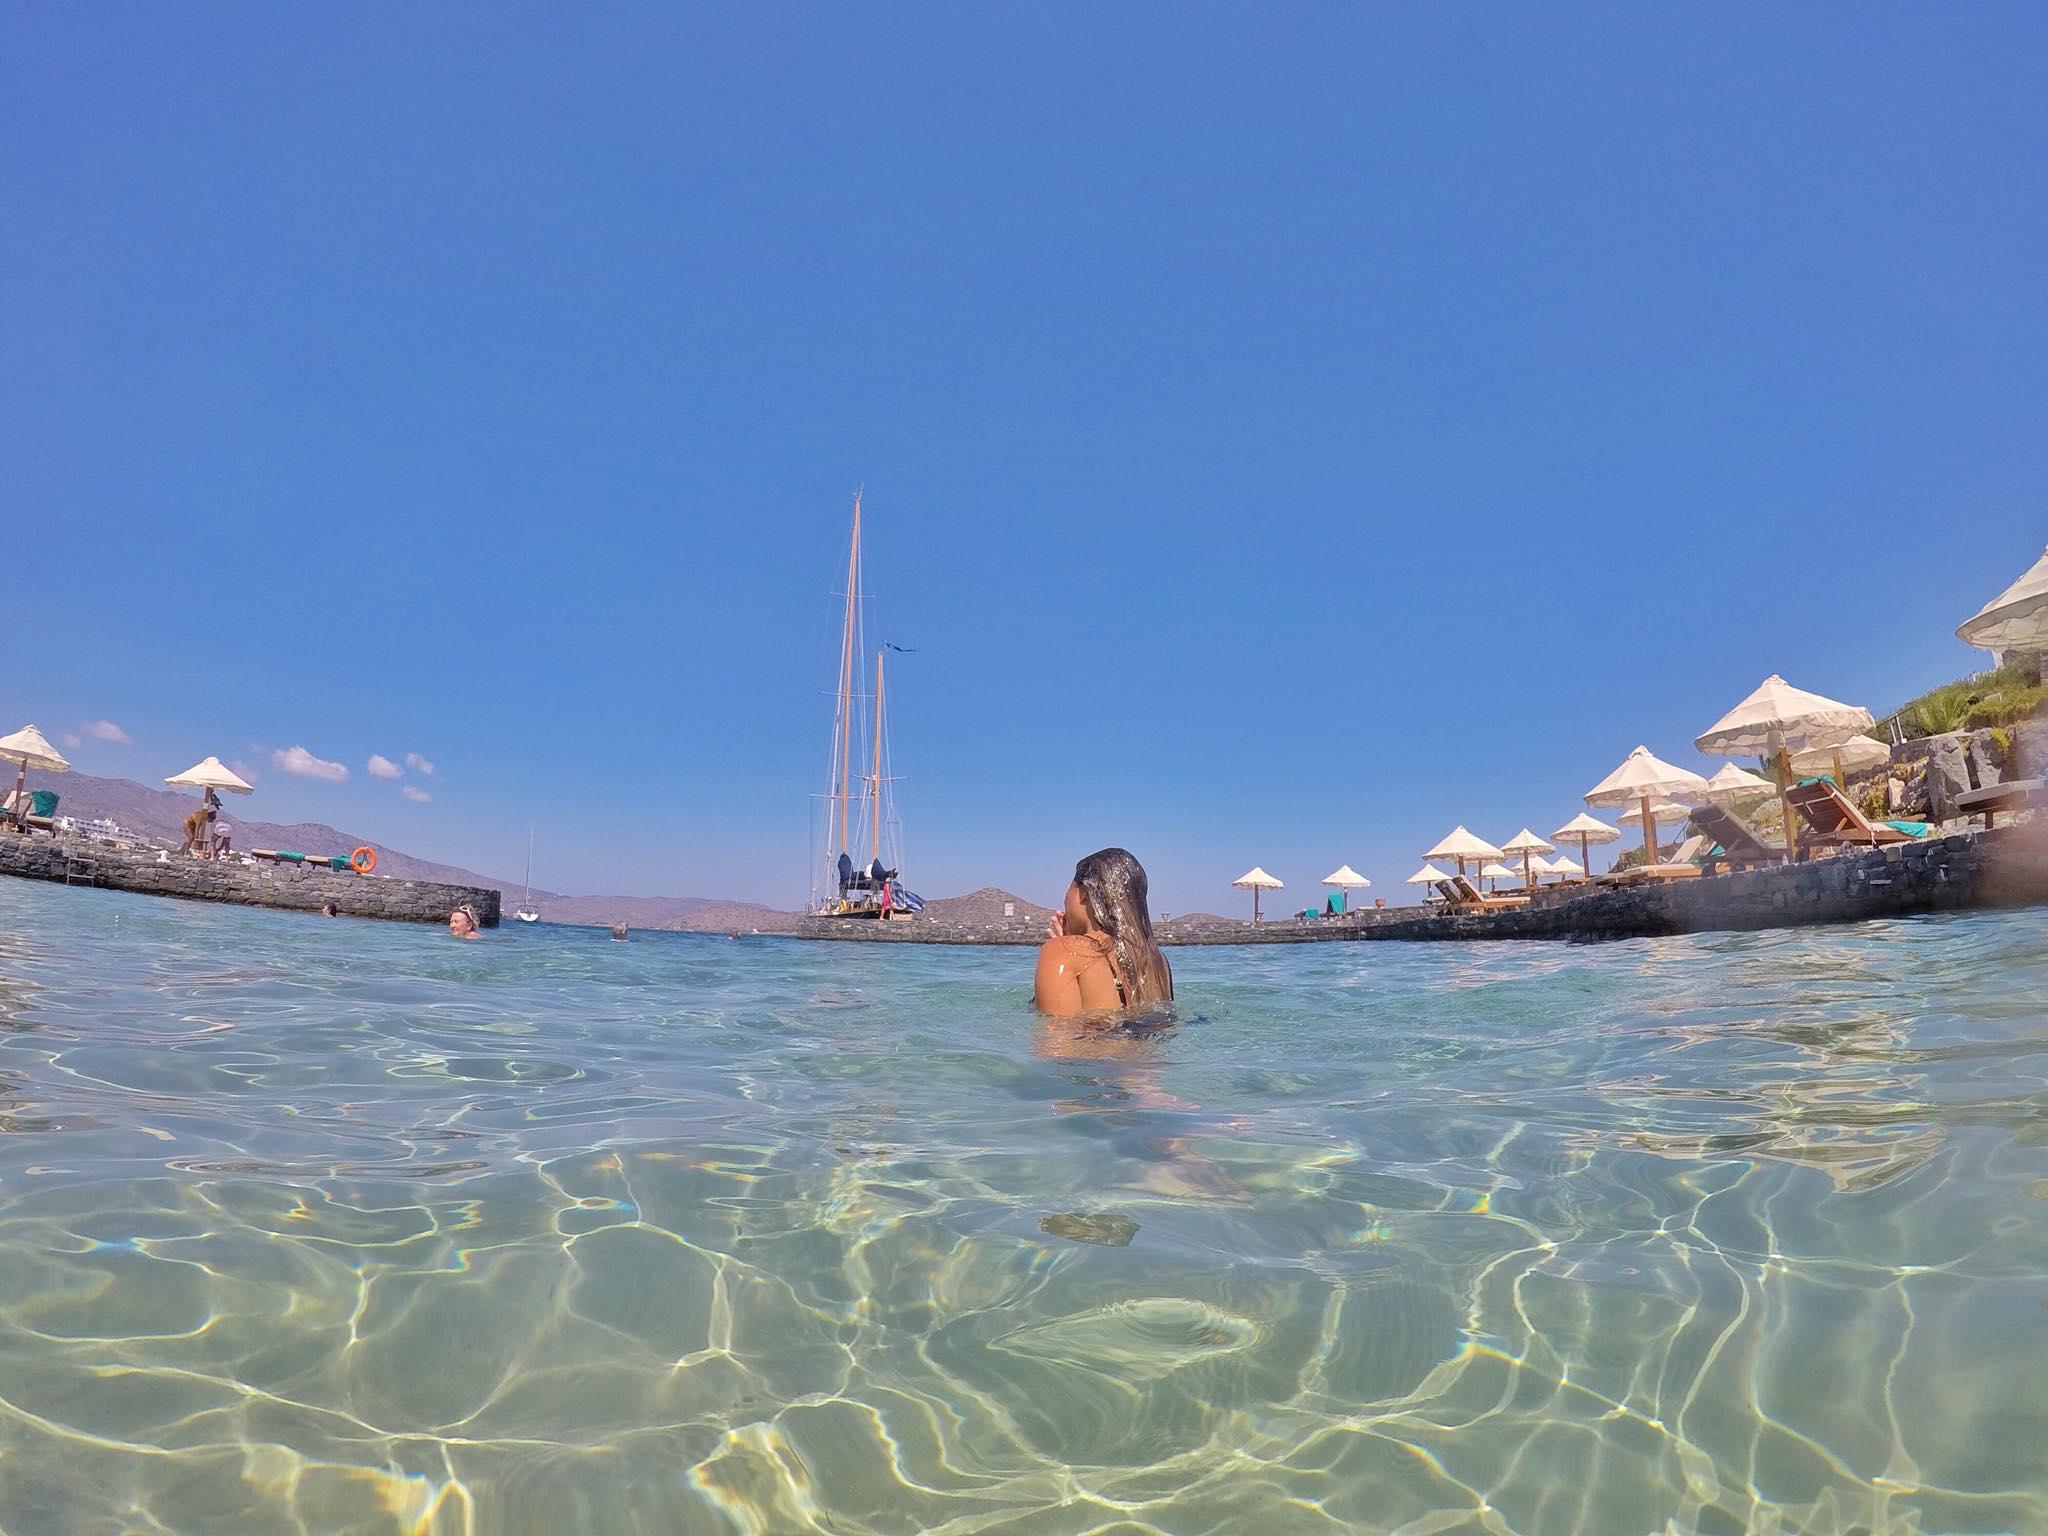 Kach Solo Travels Day 33: Experiencing 5-Star Luxury in Elounda Peninsula